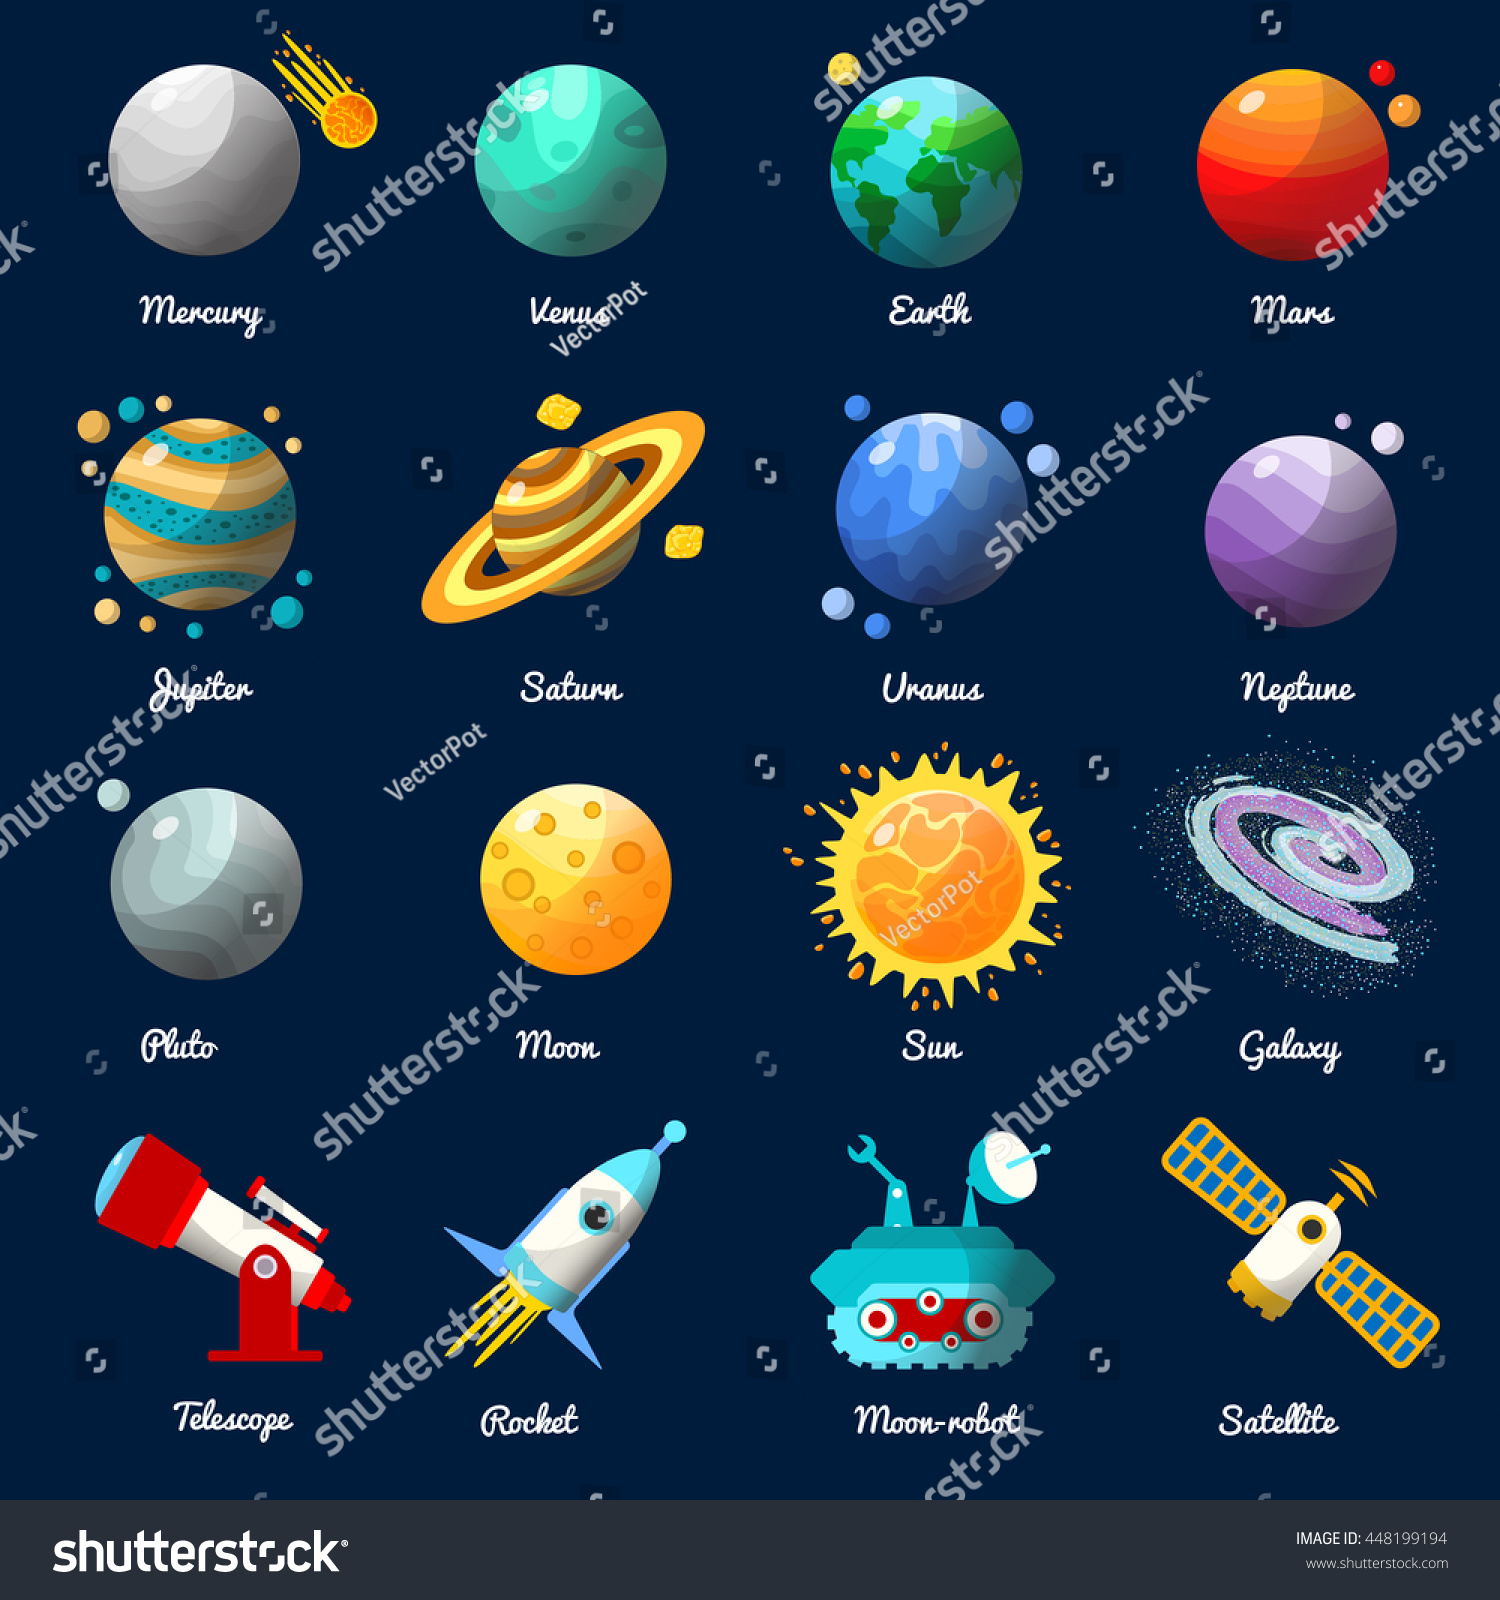 spacecraft names - photo #10